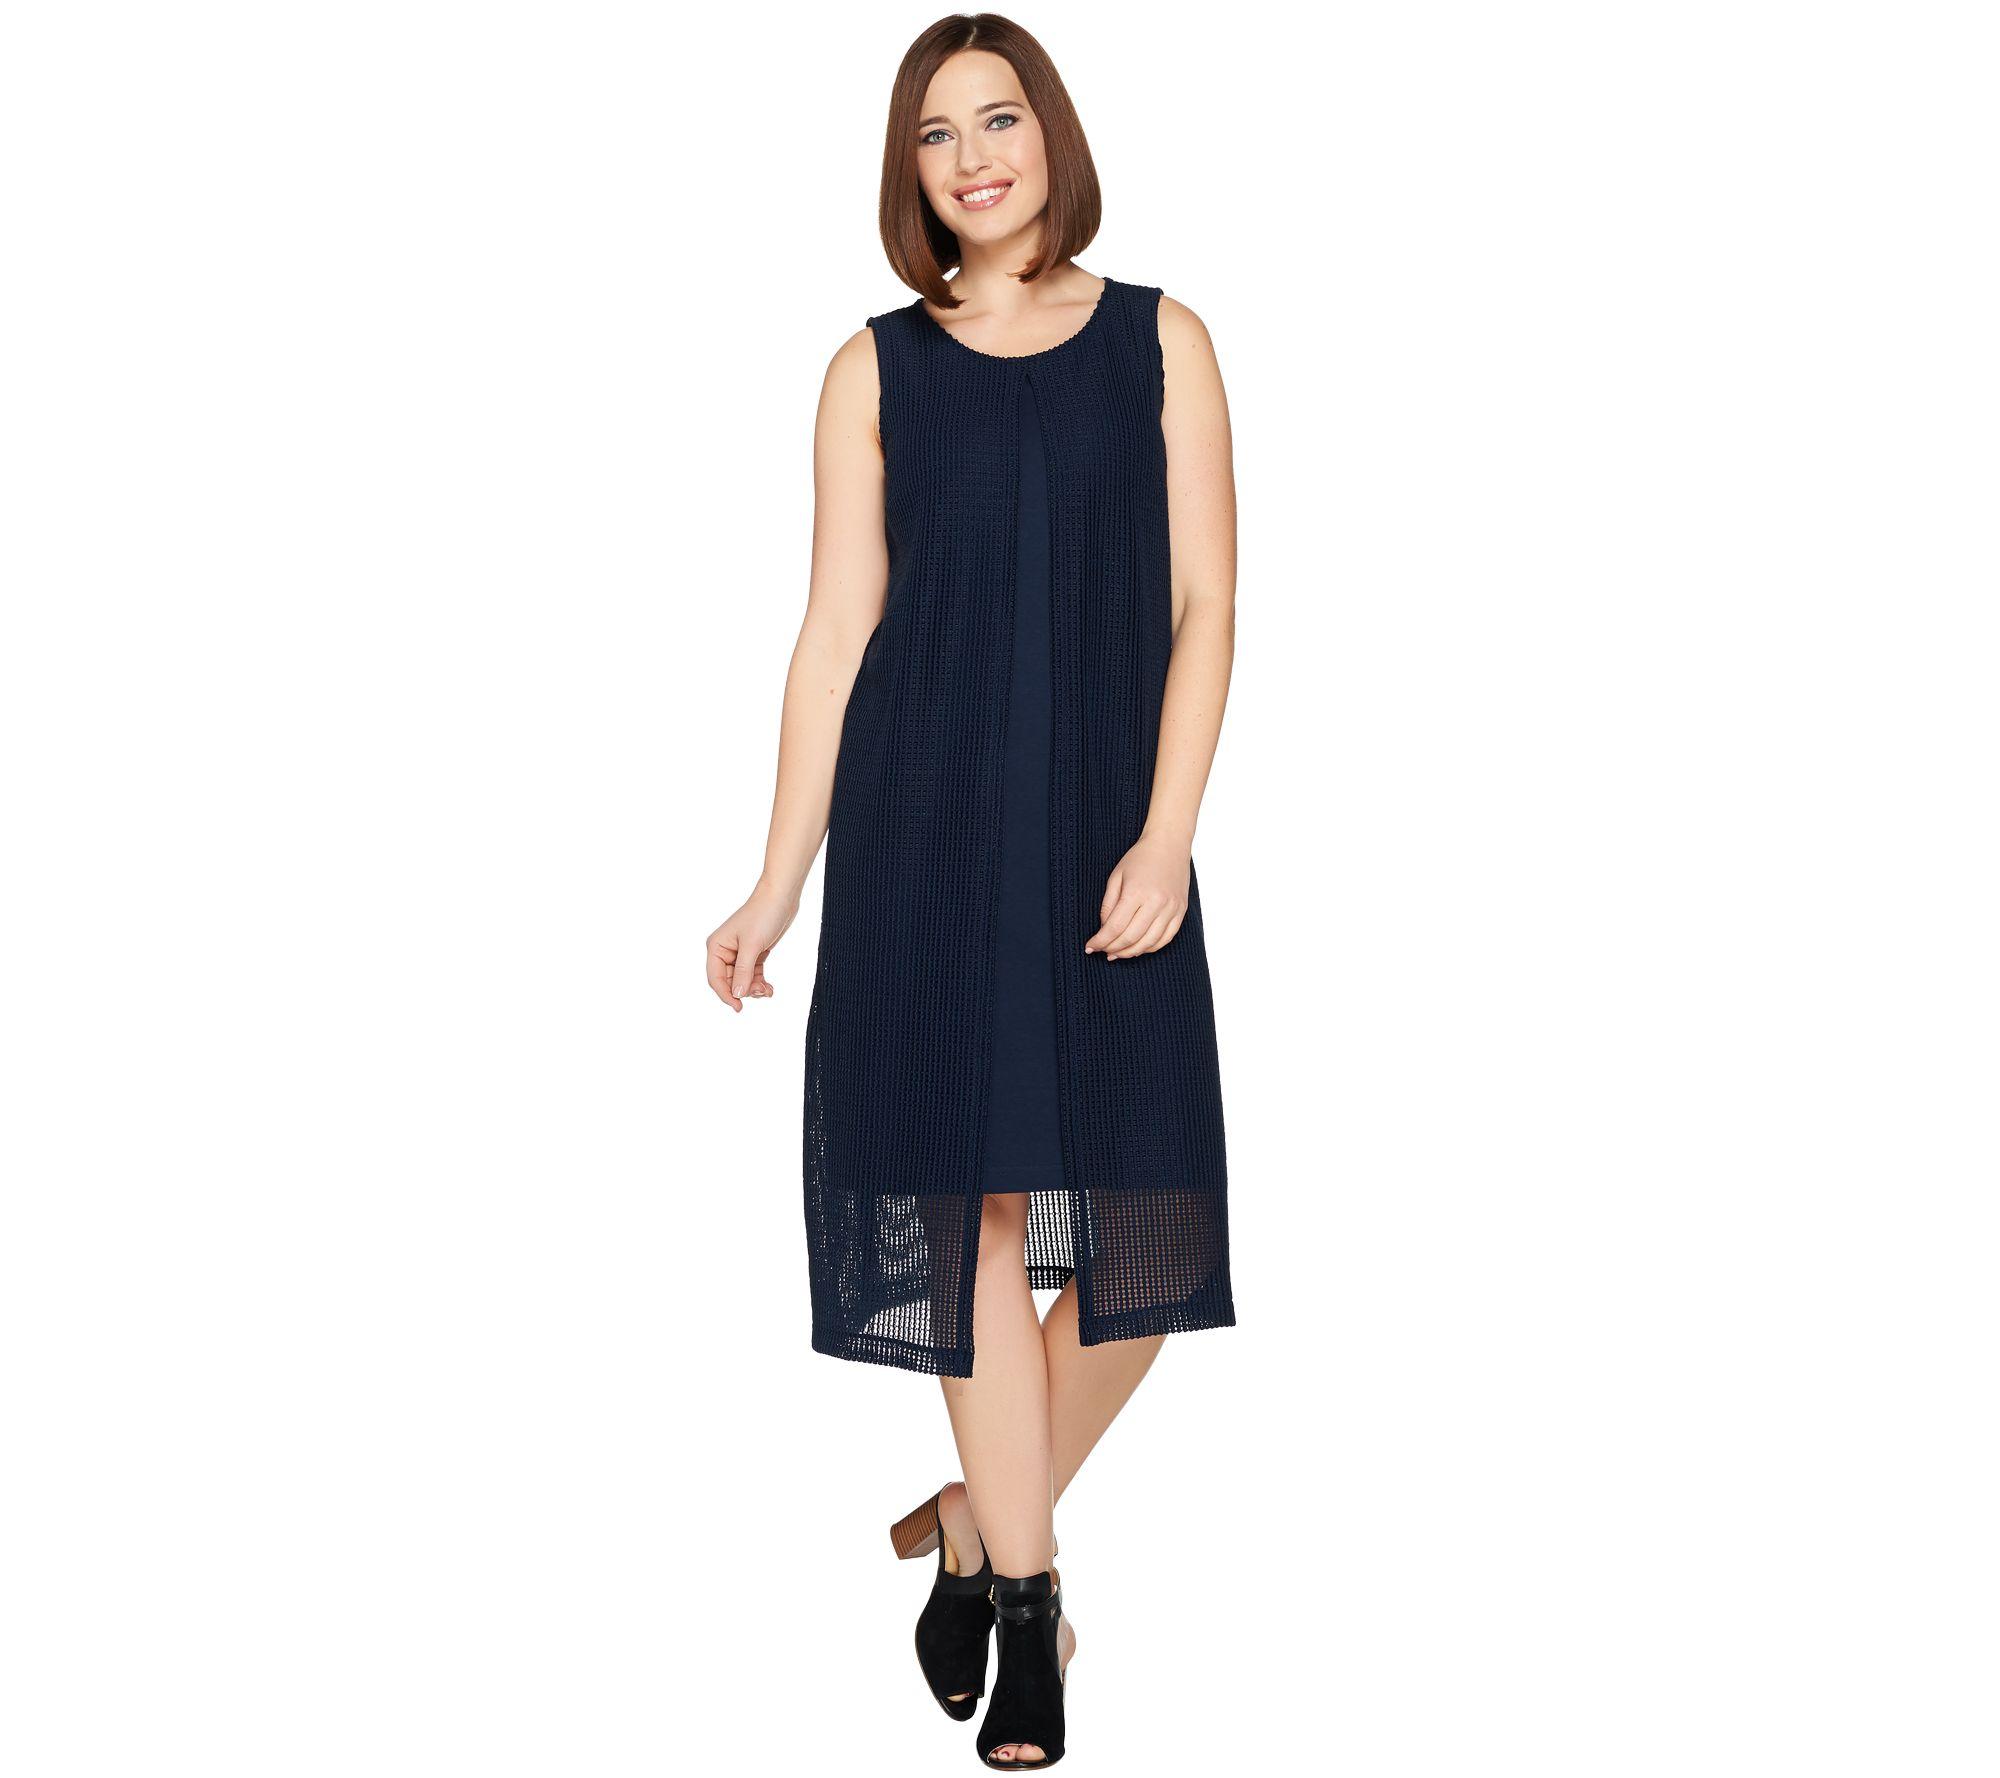 H by Halston Petite Sleeveless Knit Midi Dress w/ Knit Overlay - A288612